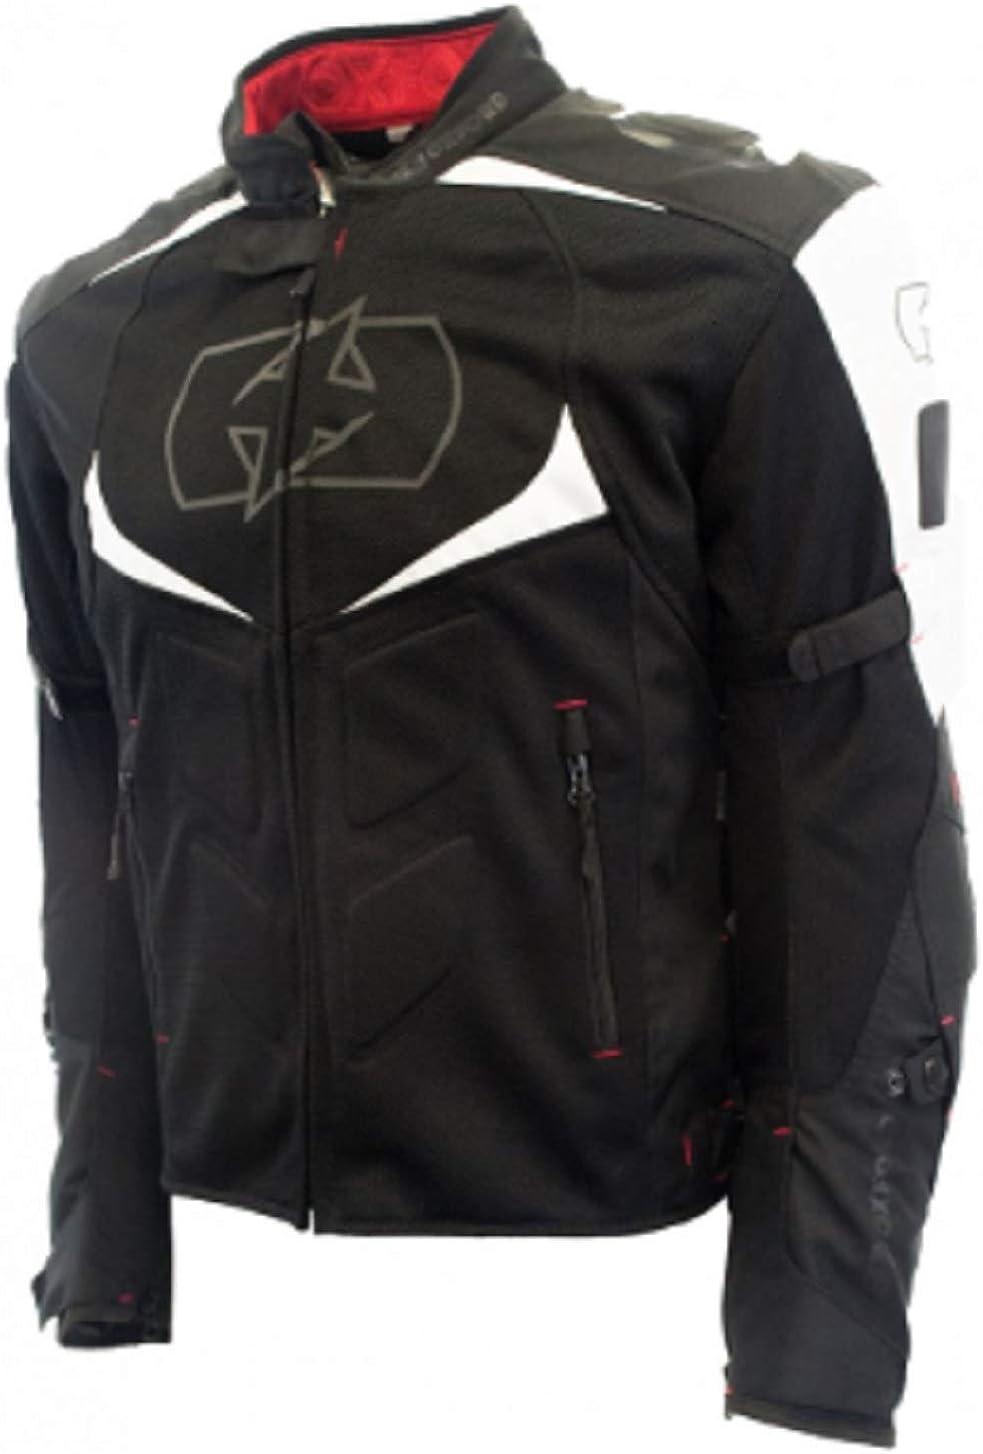 Oxford - Max 45% OFF 2021 new Men's Riding Jacket